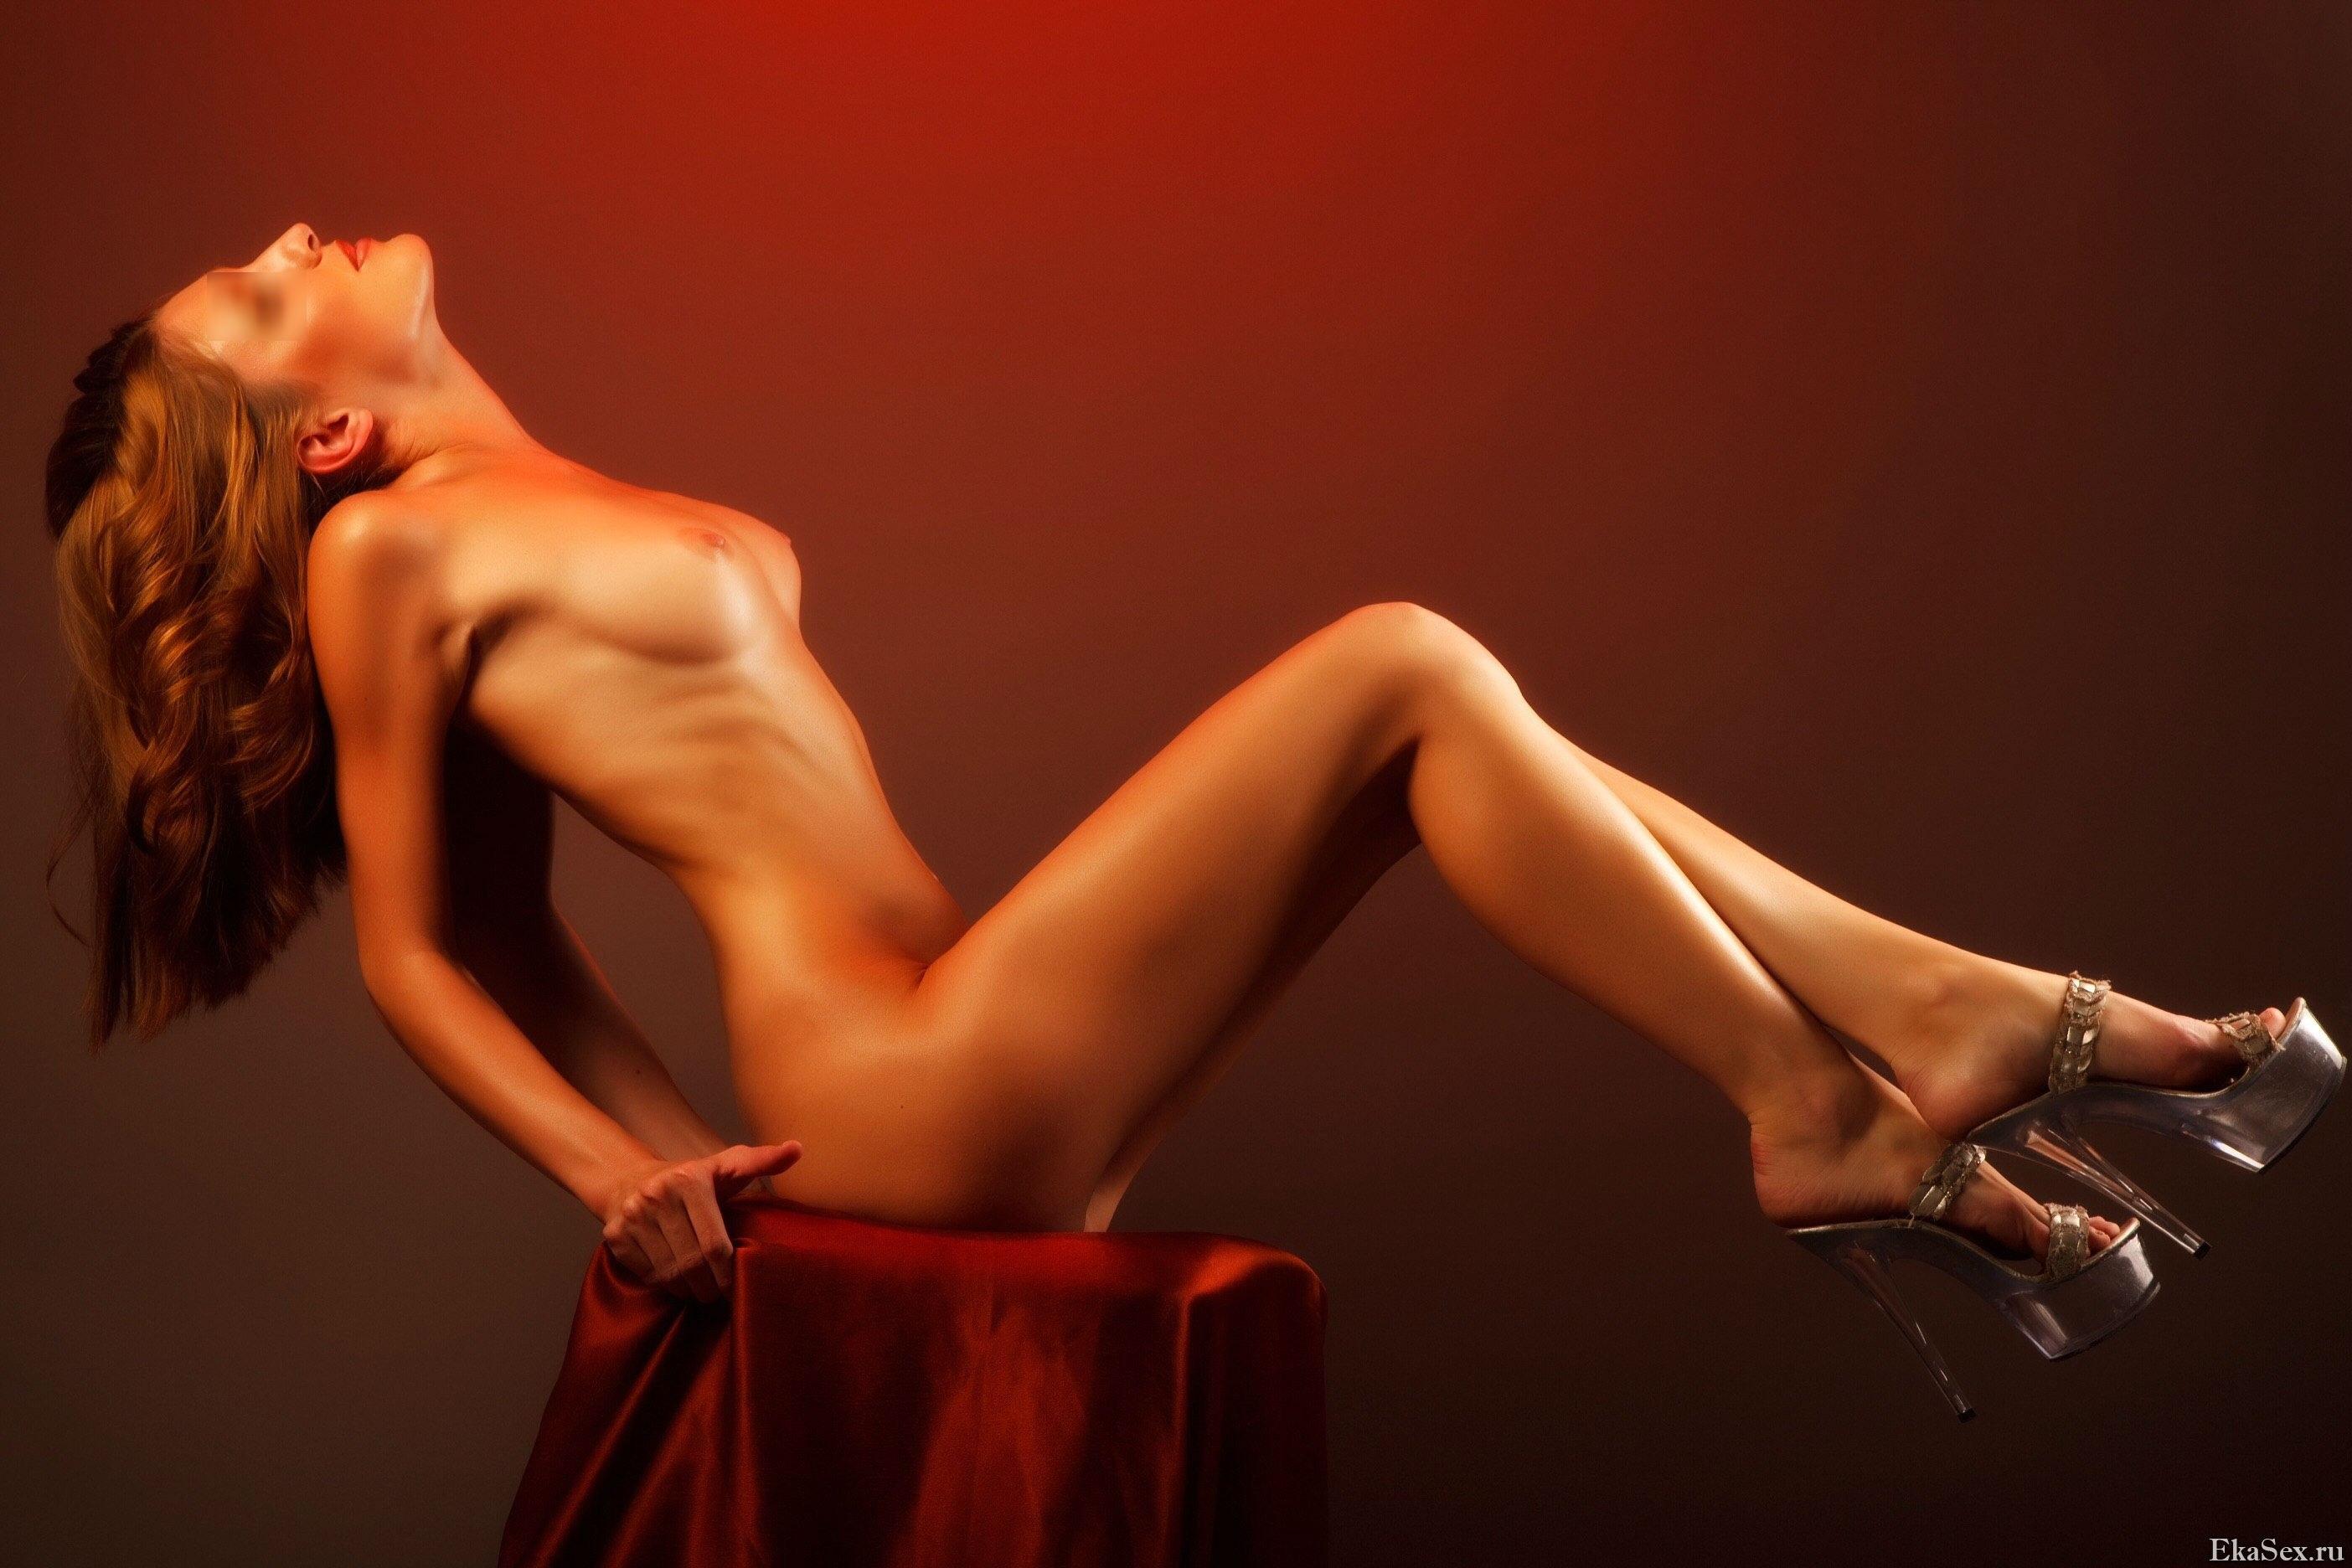 фото проститутки Аллочка из города Екатеринбург